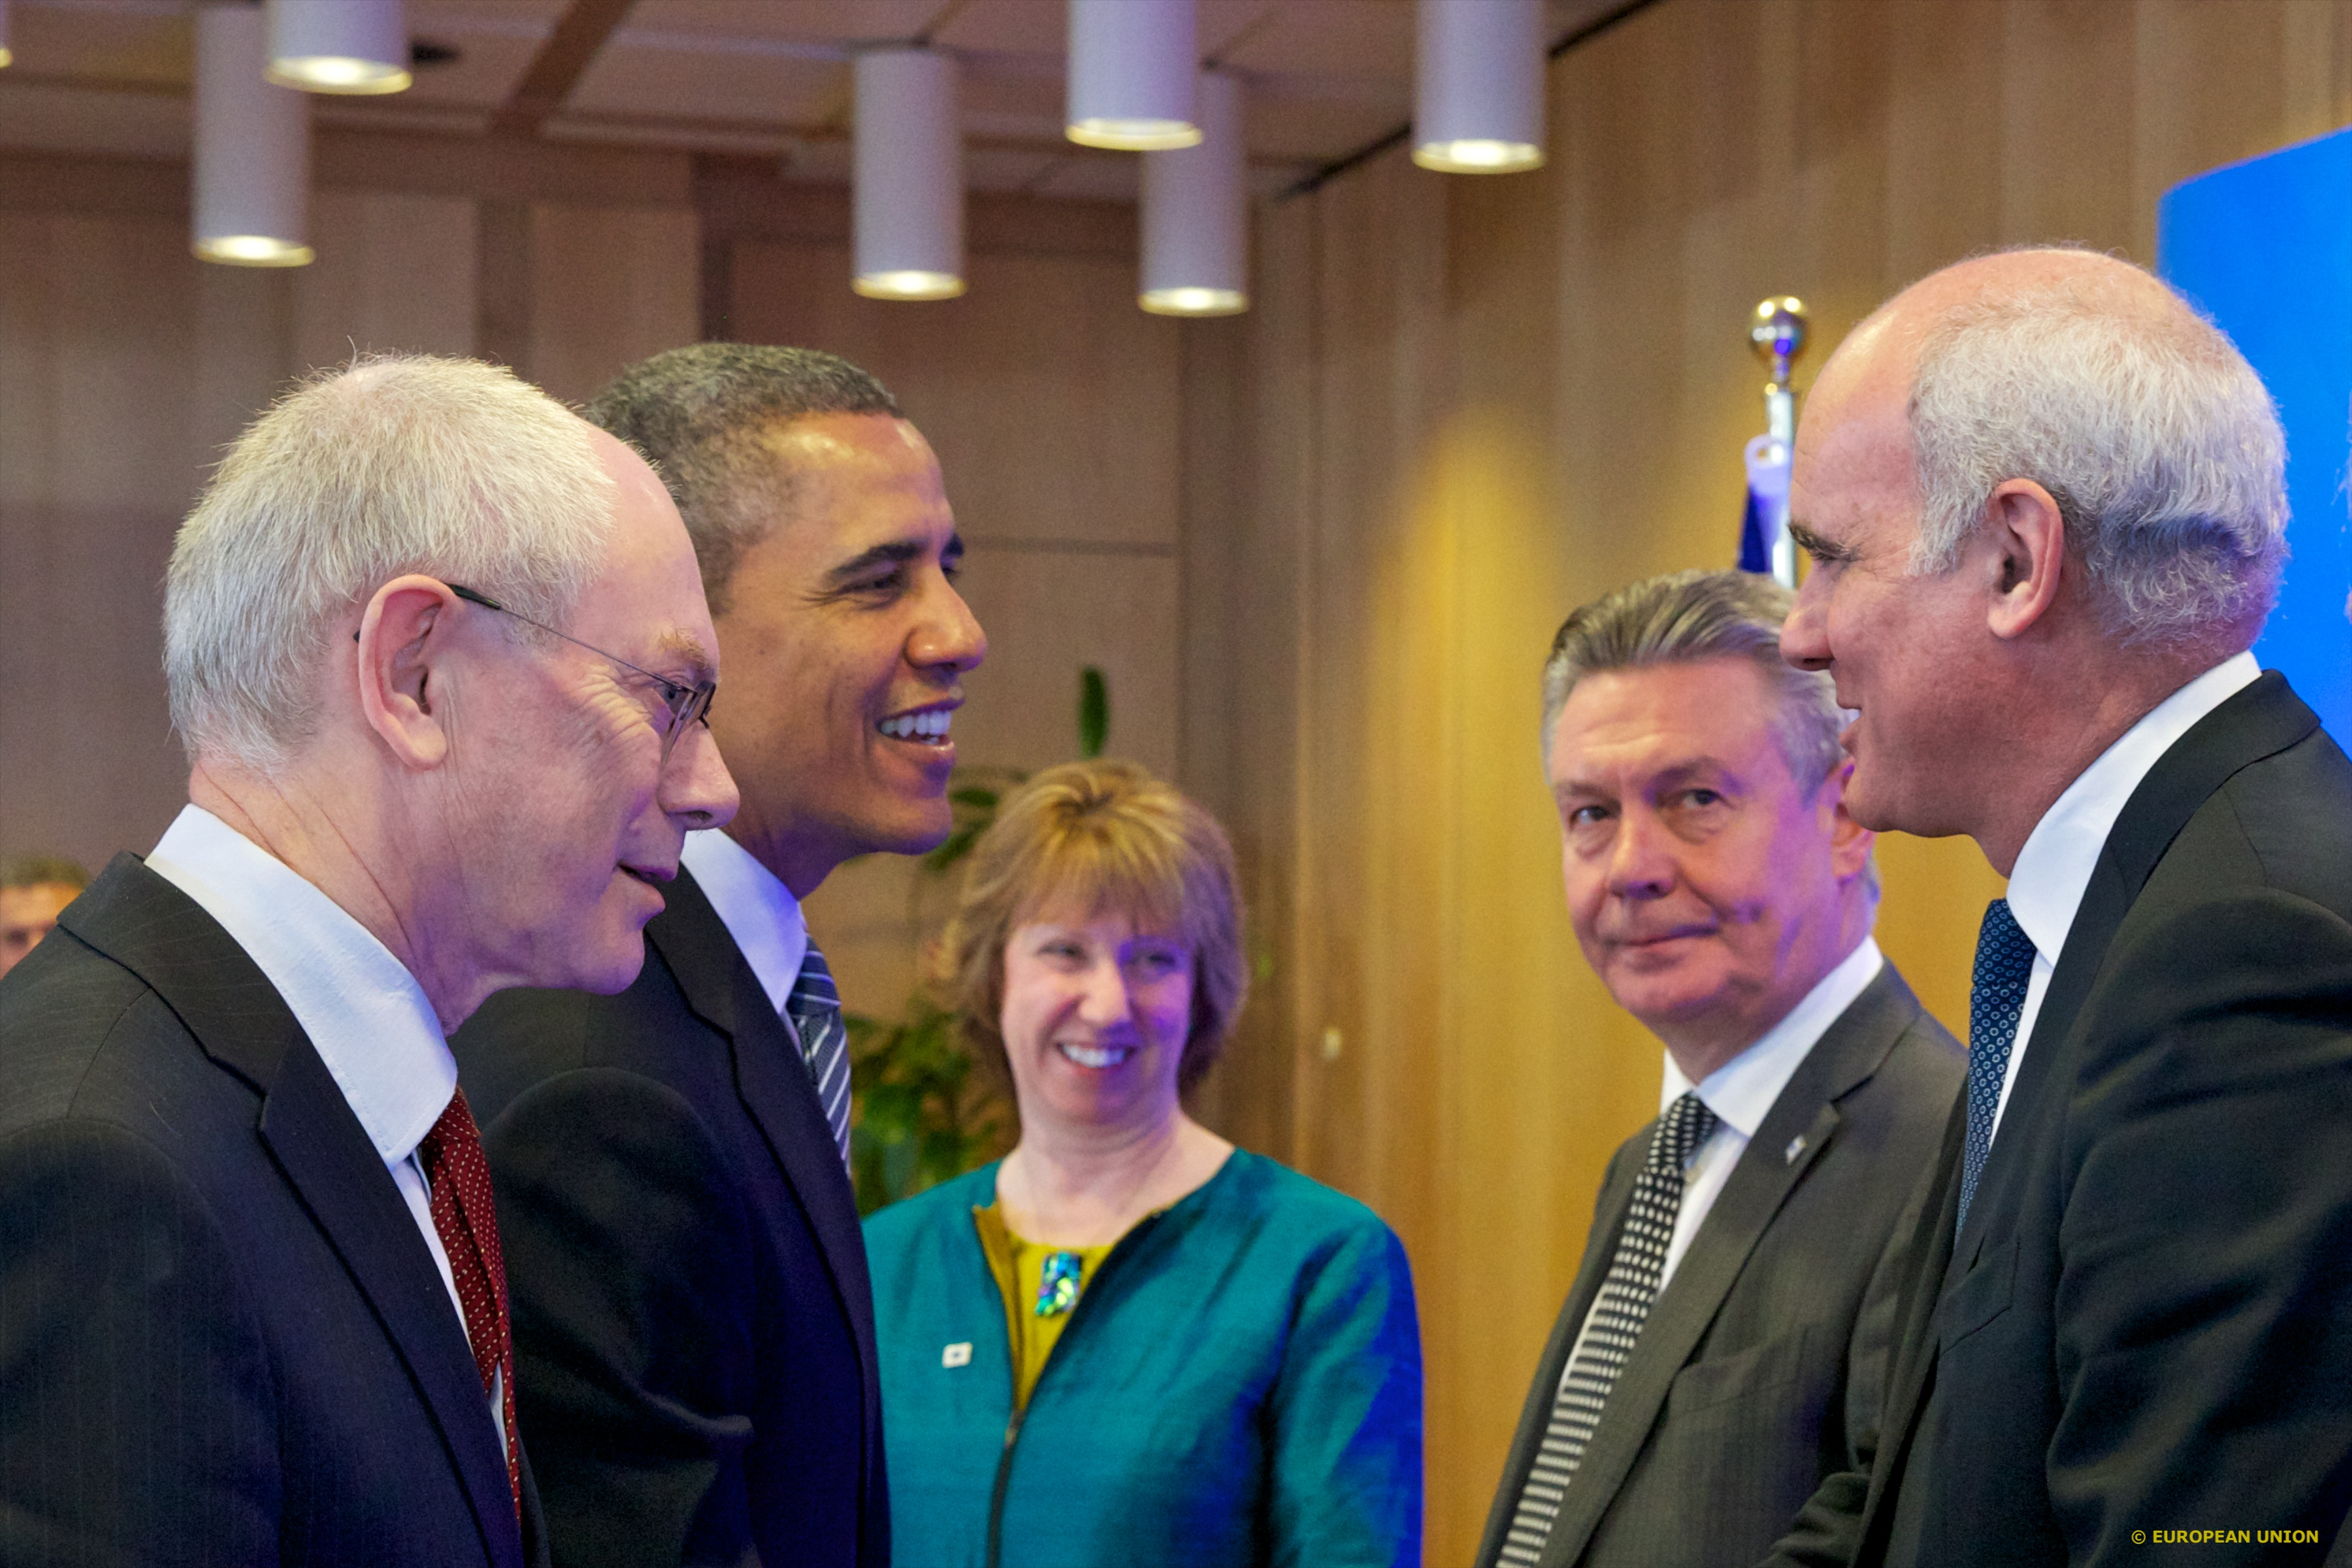 Left to right: President of the European Council Herman van Rompuy, President of the United States of American Barack Obama, EU High Representative Catherine Ashton, EU Trade Commissioner Karel de Gucht. Brussels 2014 [The Council of the European Union]